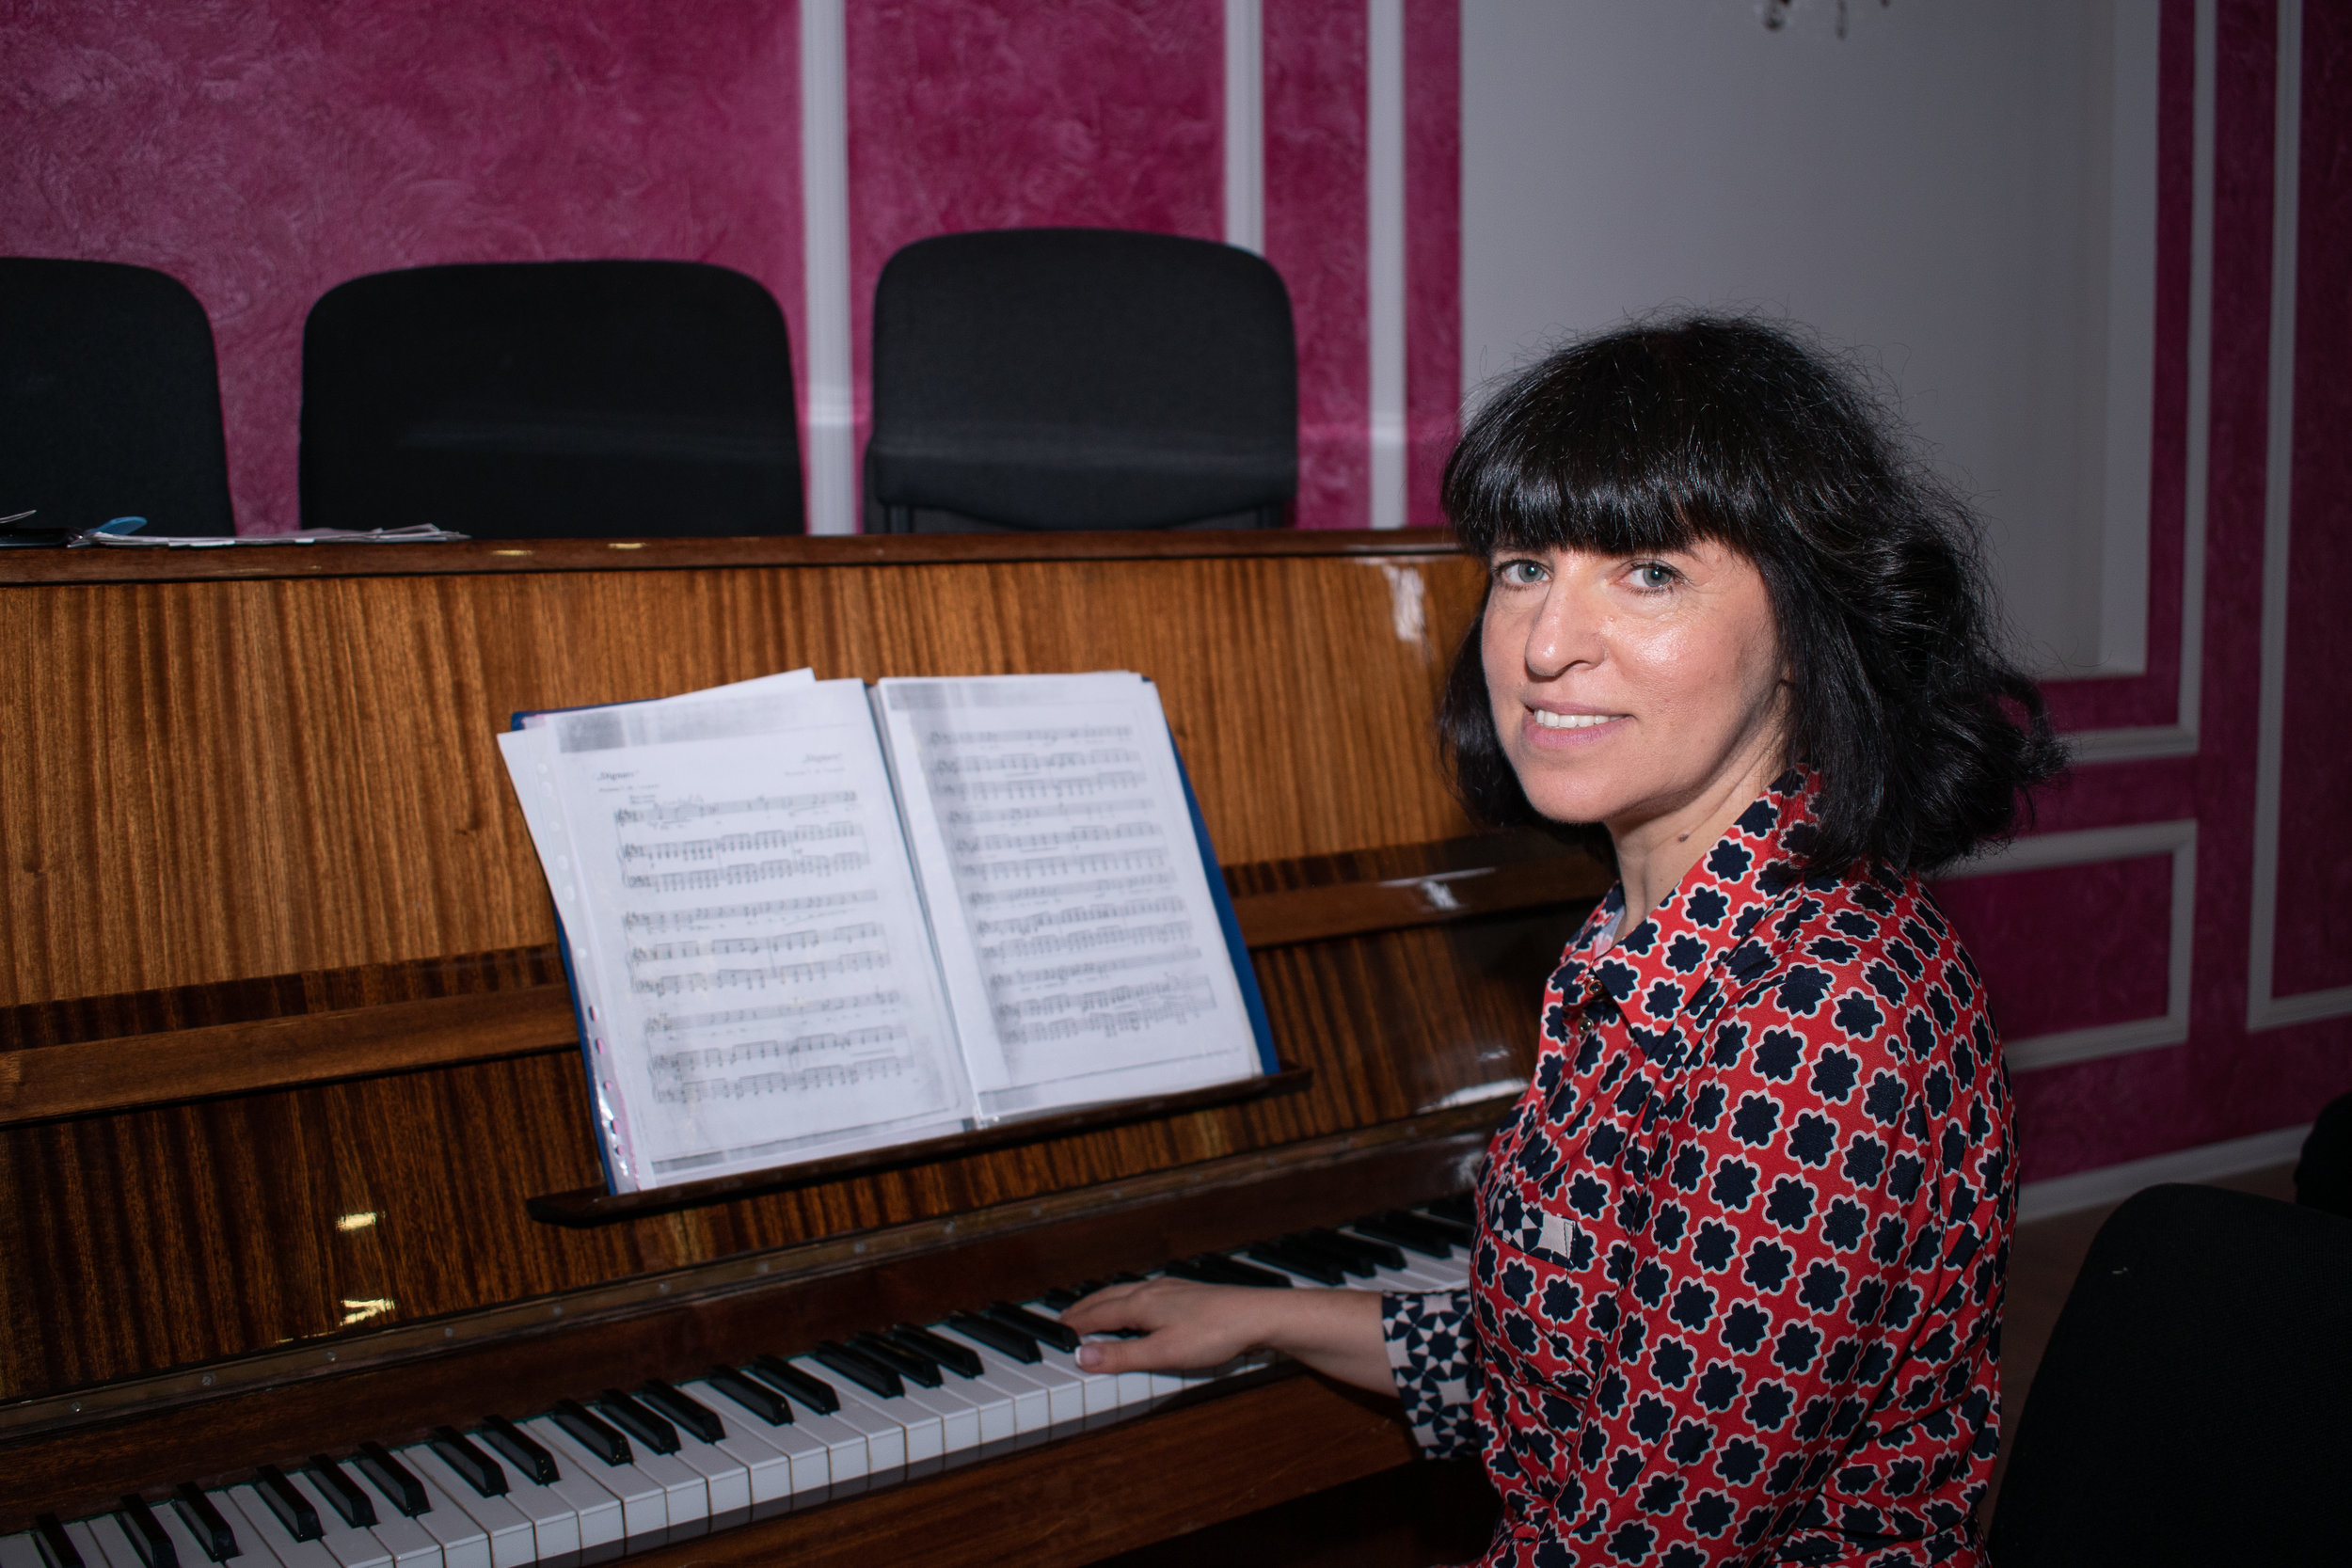 Москалюк Анаїда Тигранівна - вчитель музики, хормейстер